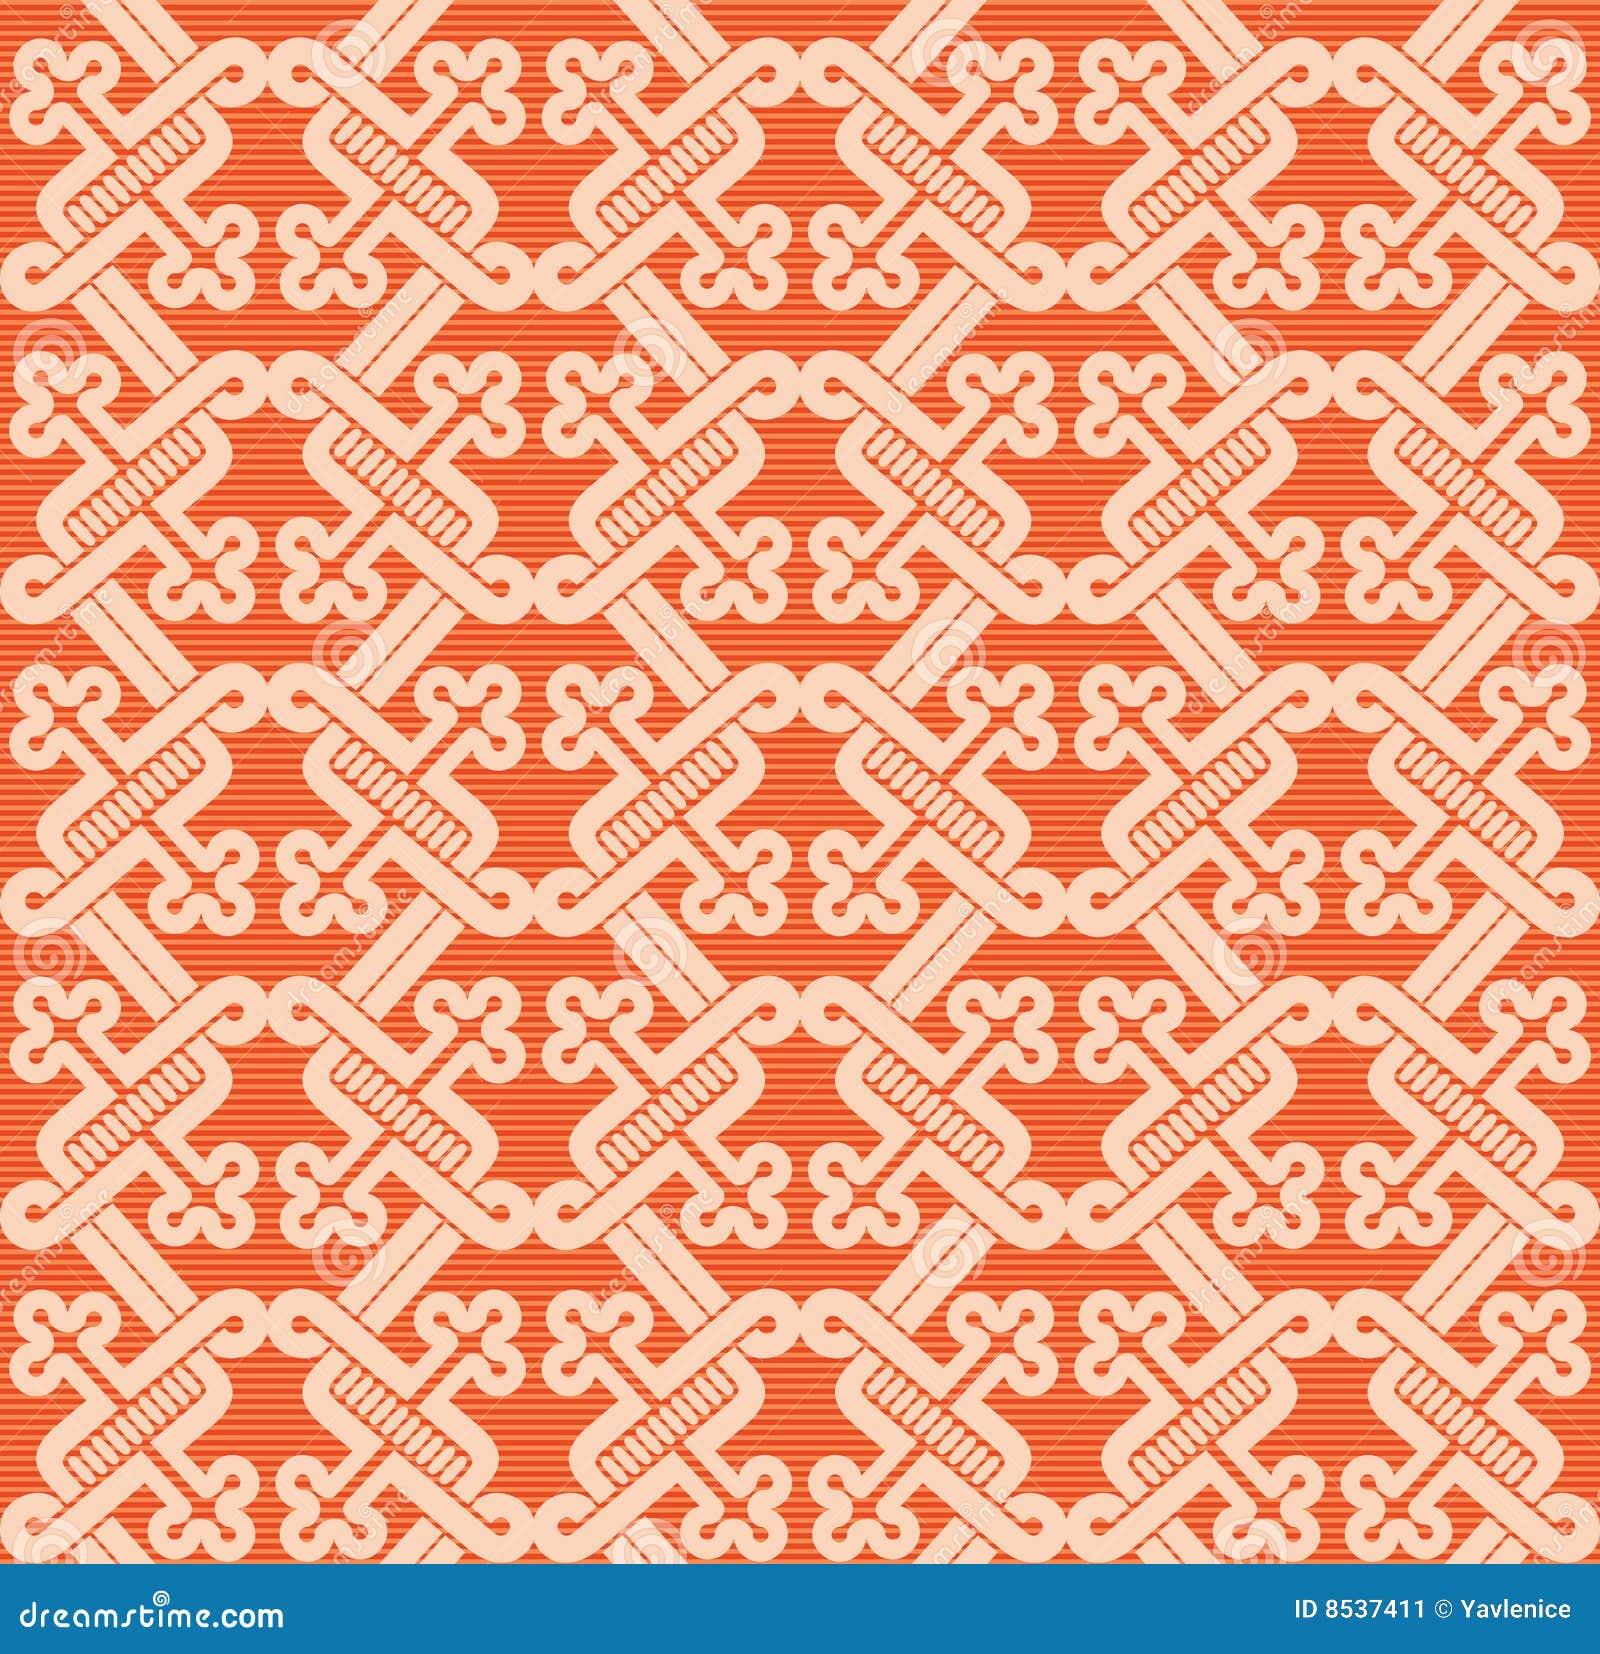 Romanesque pattern